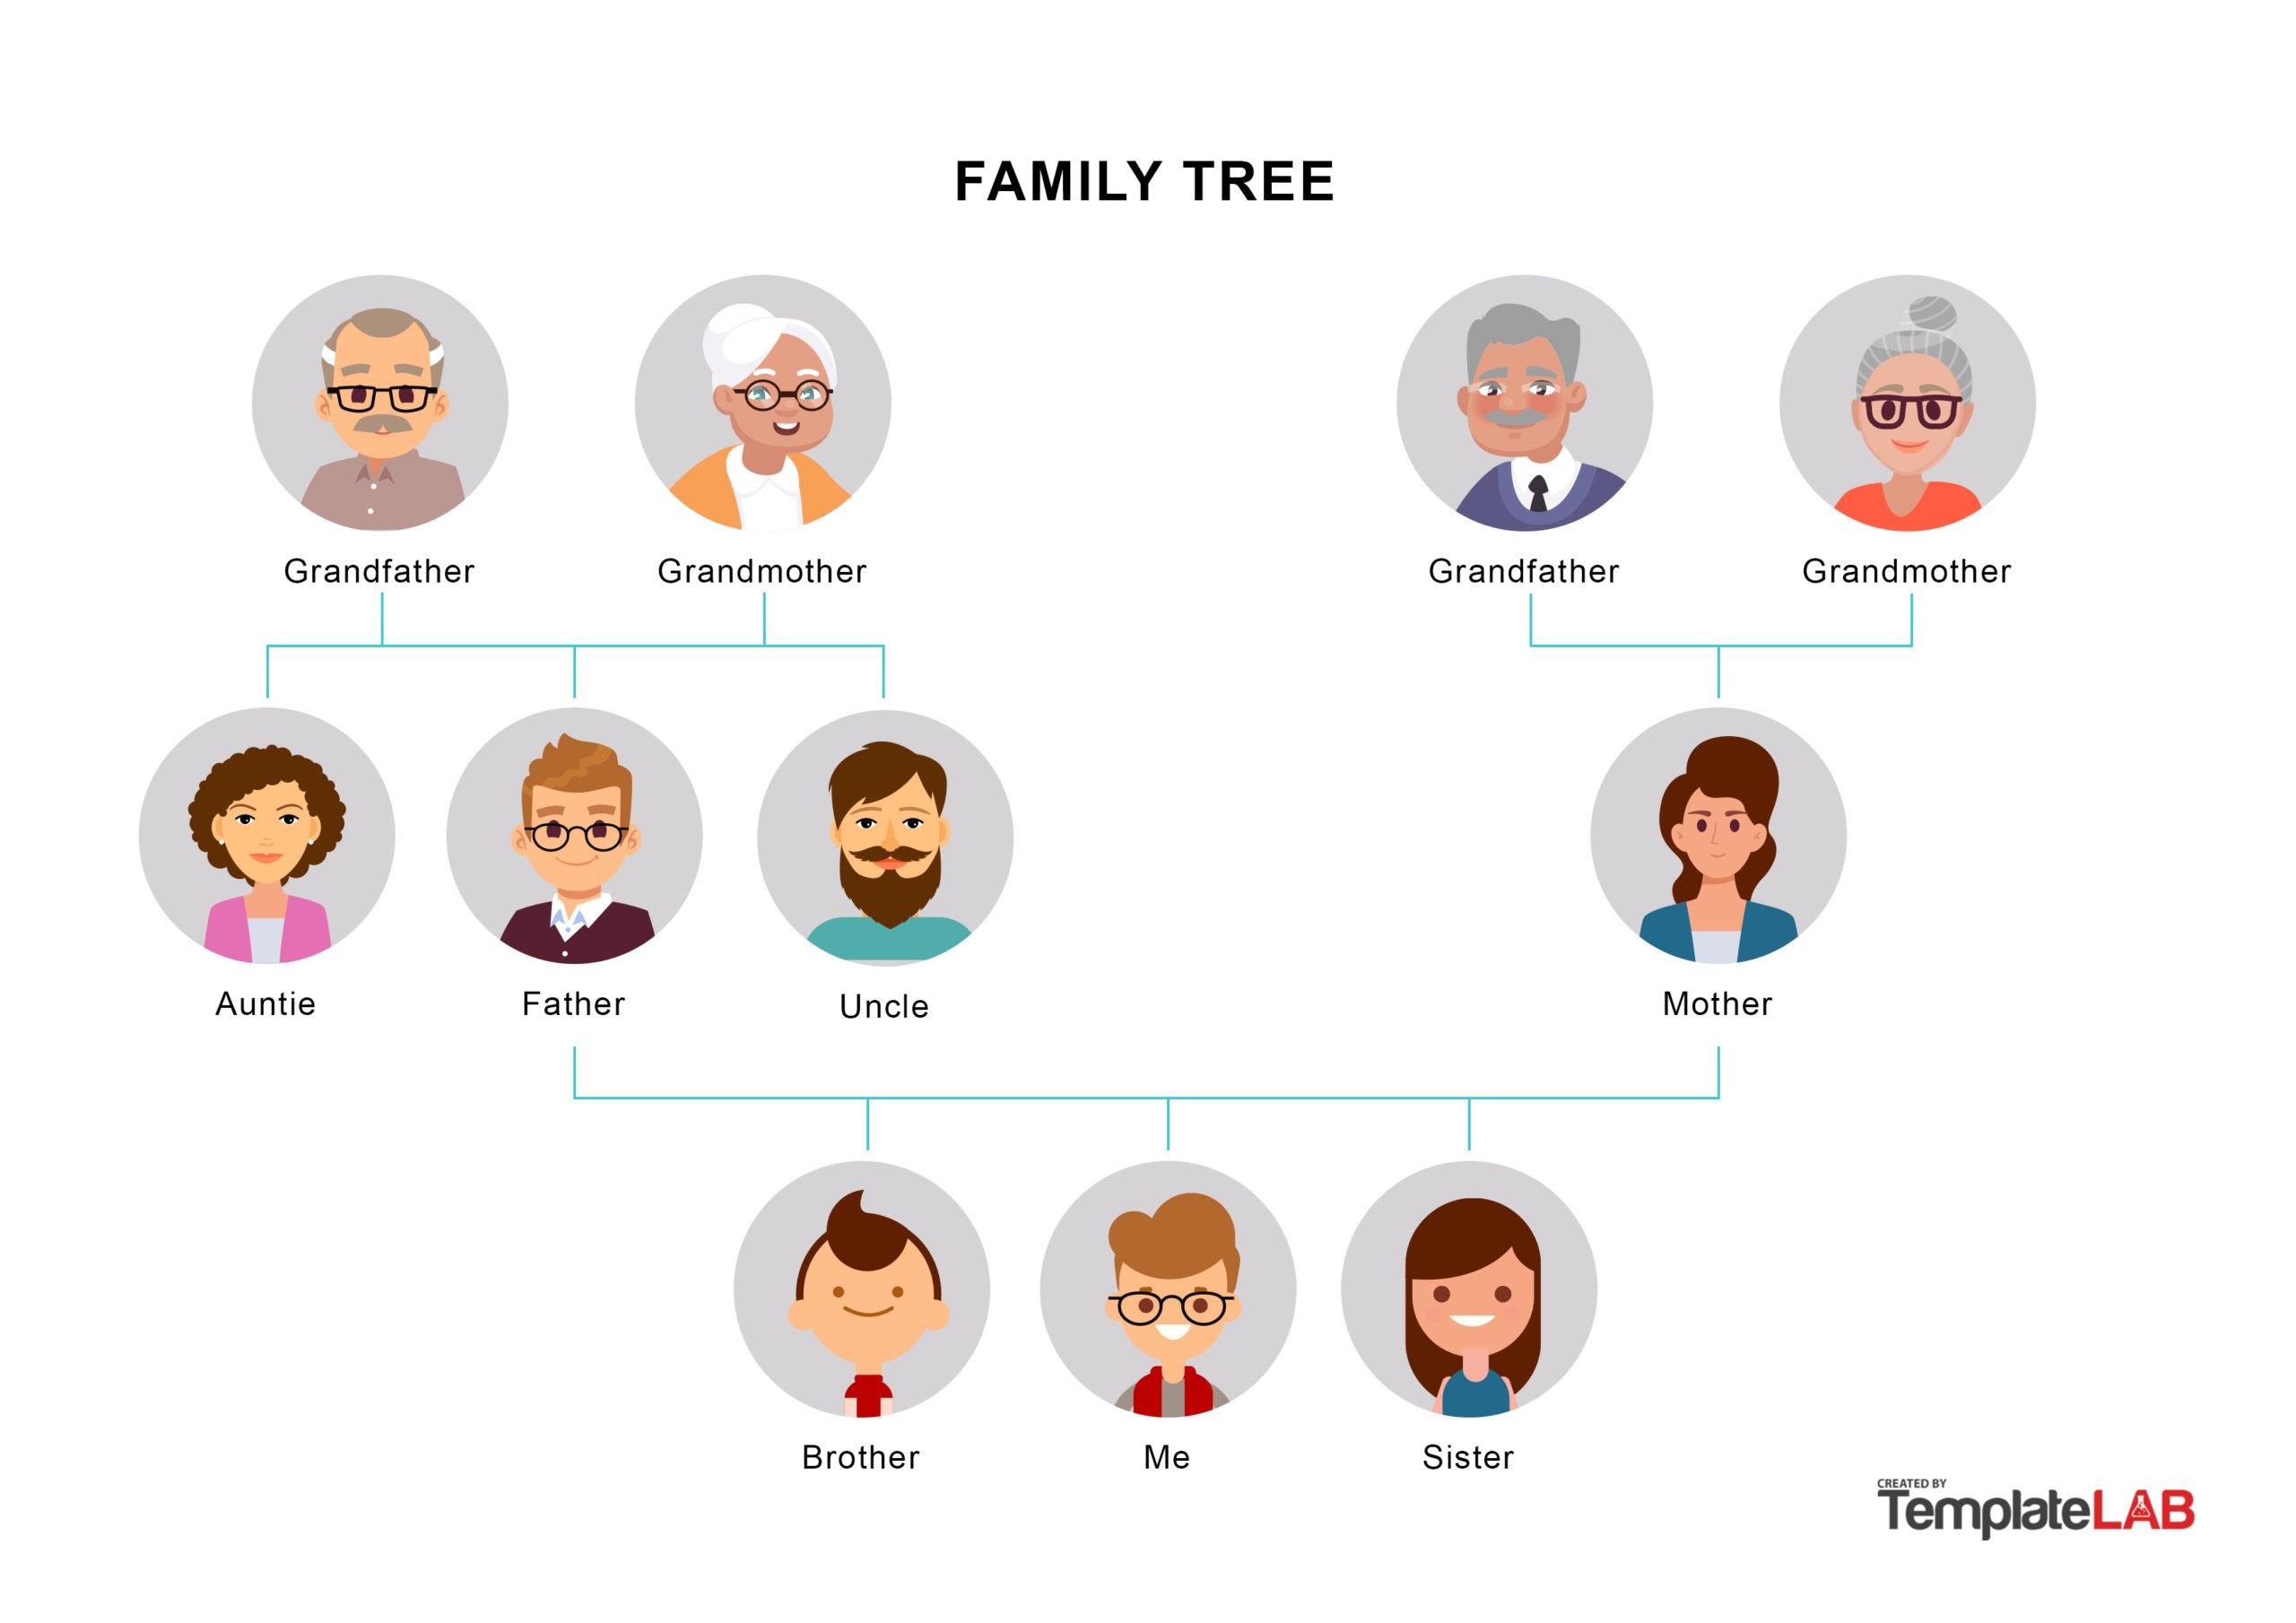 Free Family Tree Template 11 - TemplateLab.com